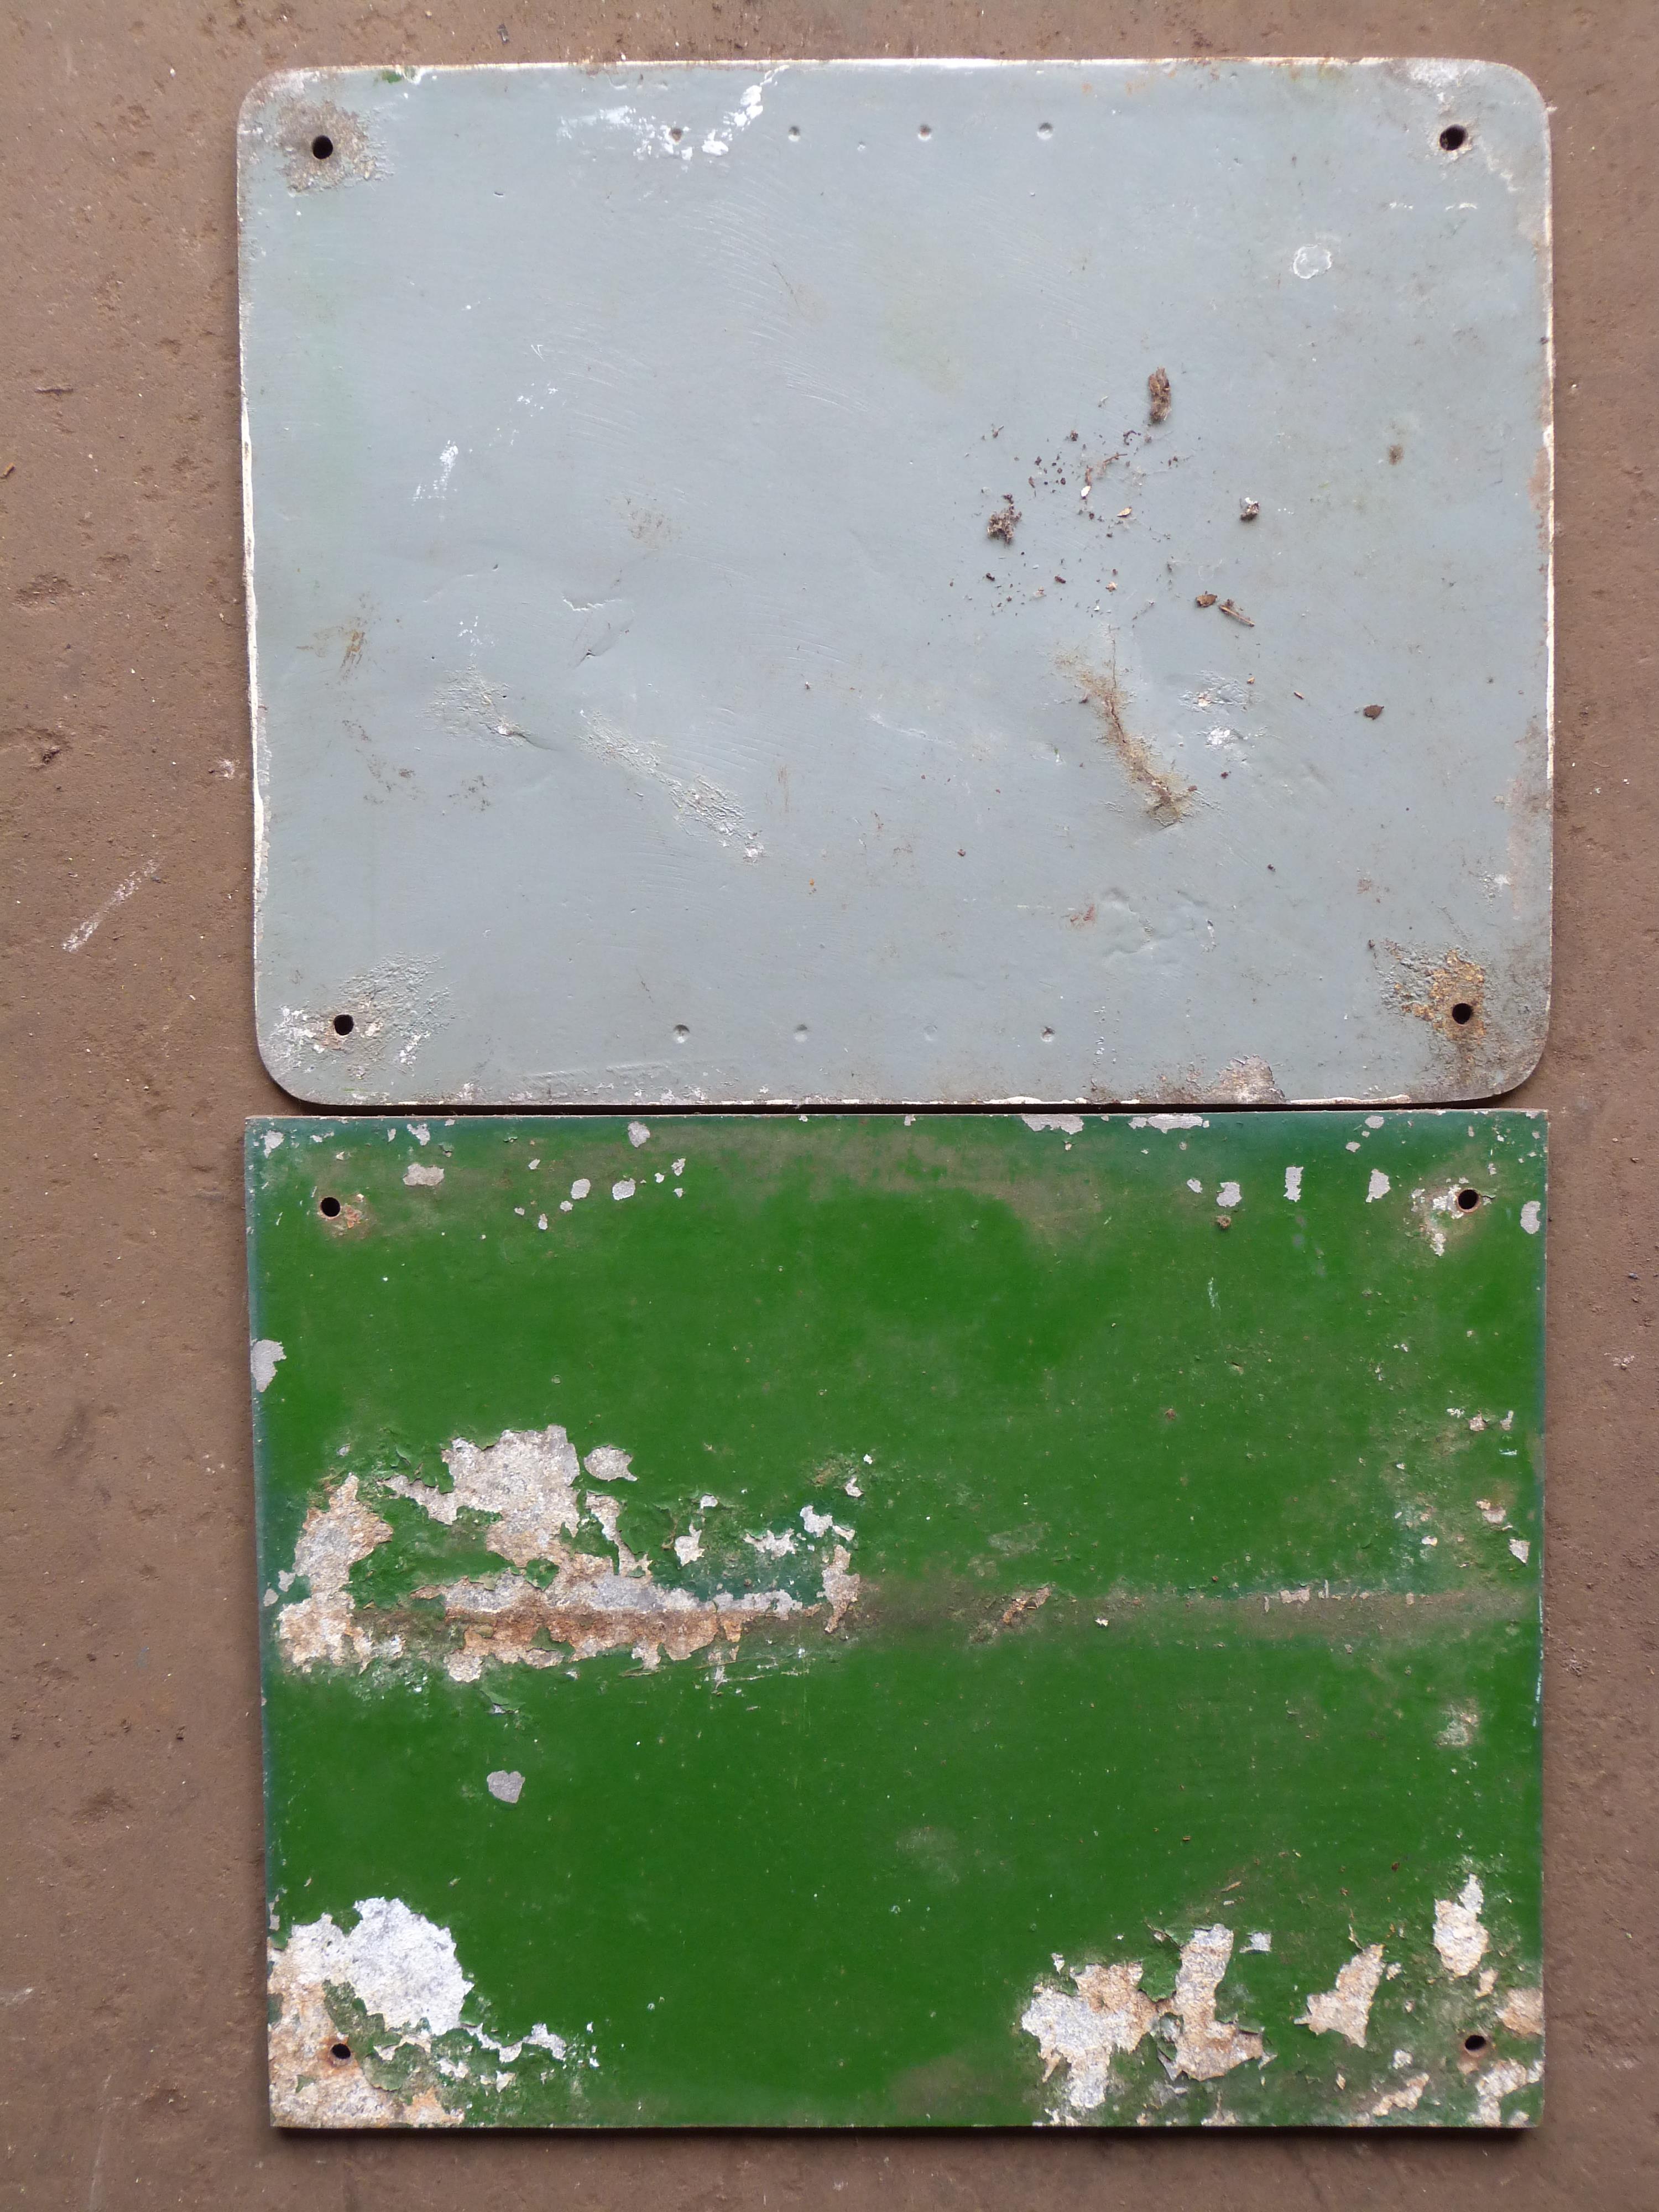 Two cast aluminium Malvern Hills Conservators signs, 30 x 38cm - Image 2 of 2